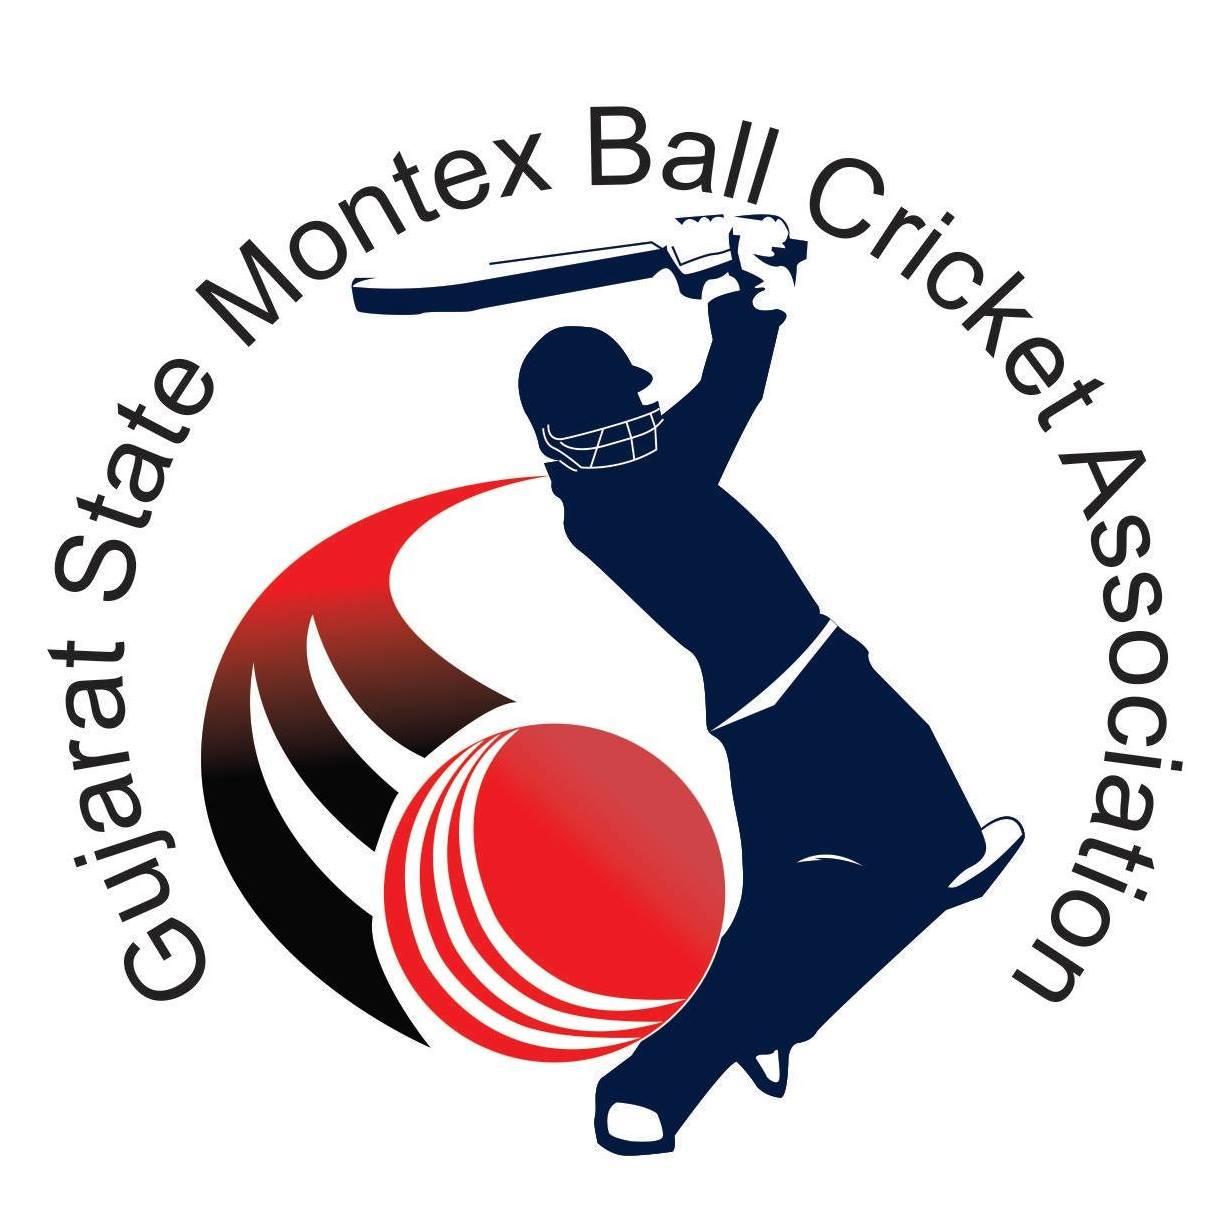 Gandhinagar Montex Ball Cricket Championship